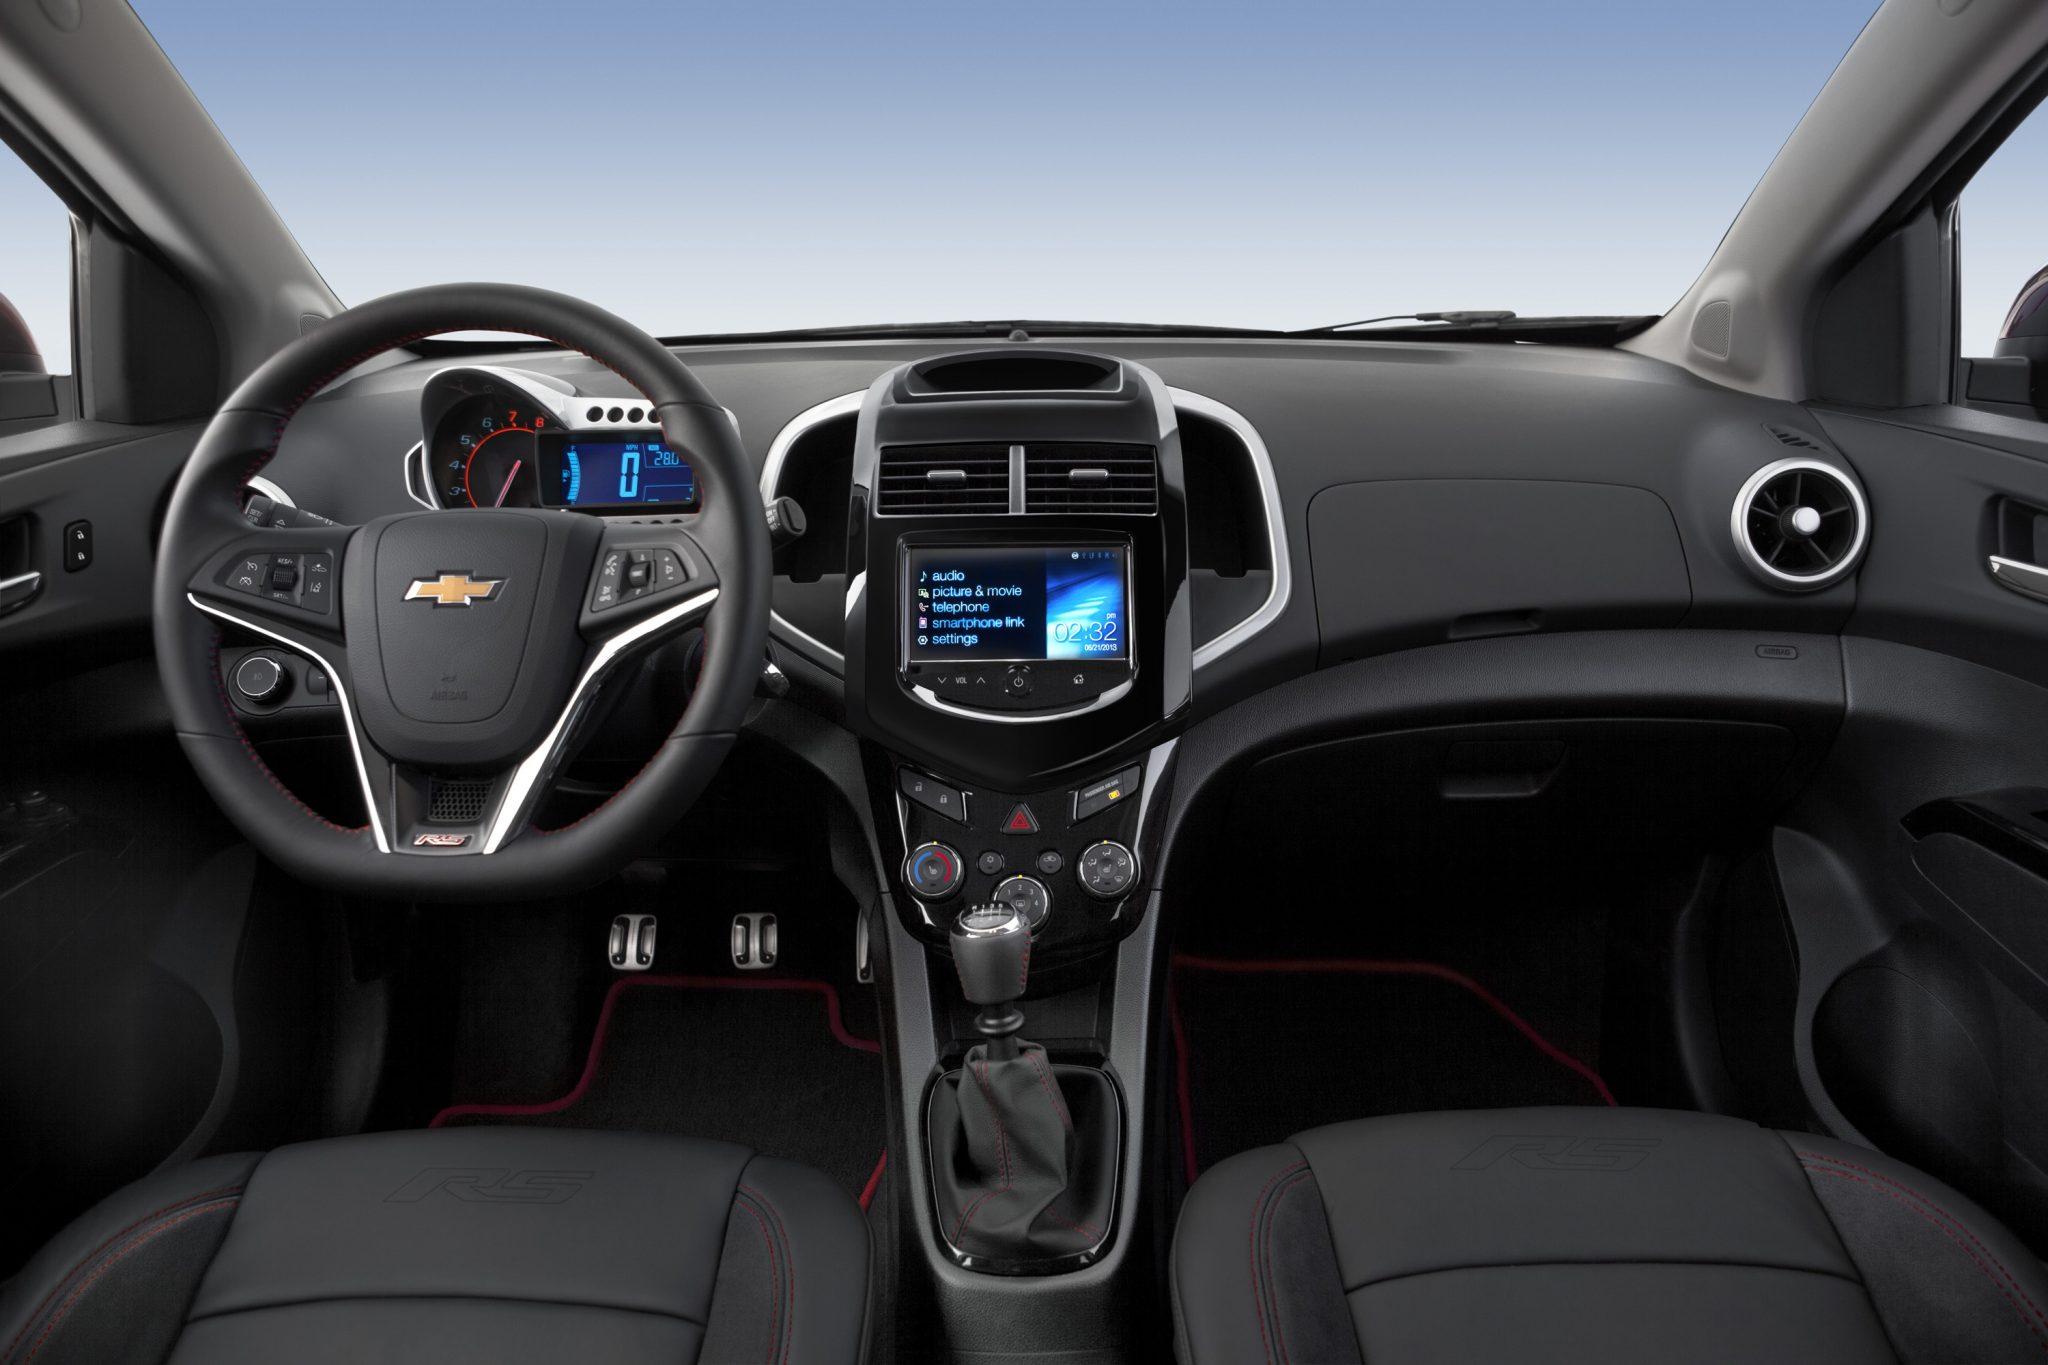 chevrolet sonic sedan cars specs present